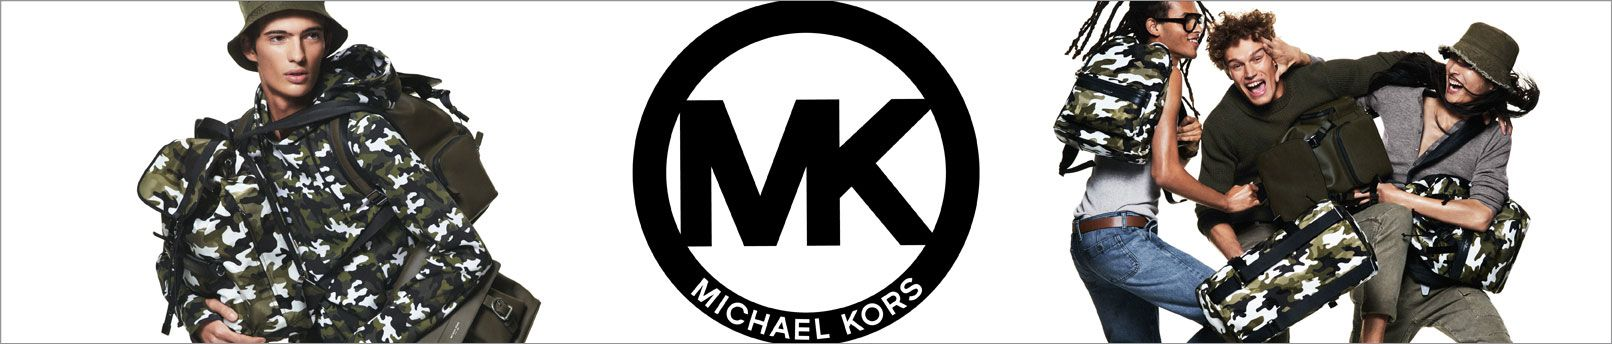 Michael Kors shoppen